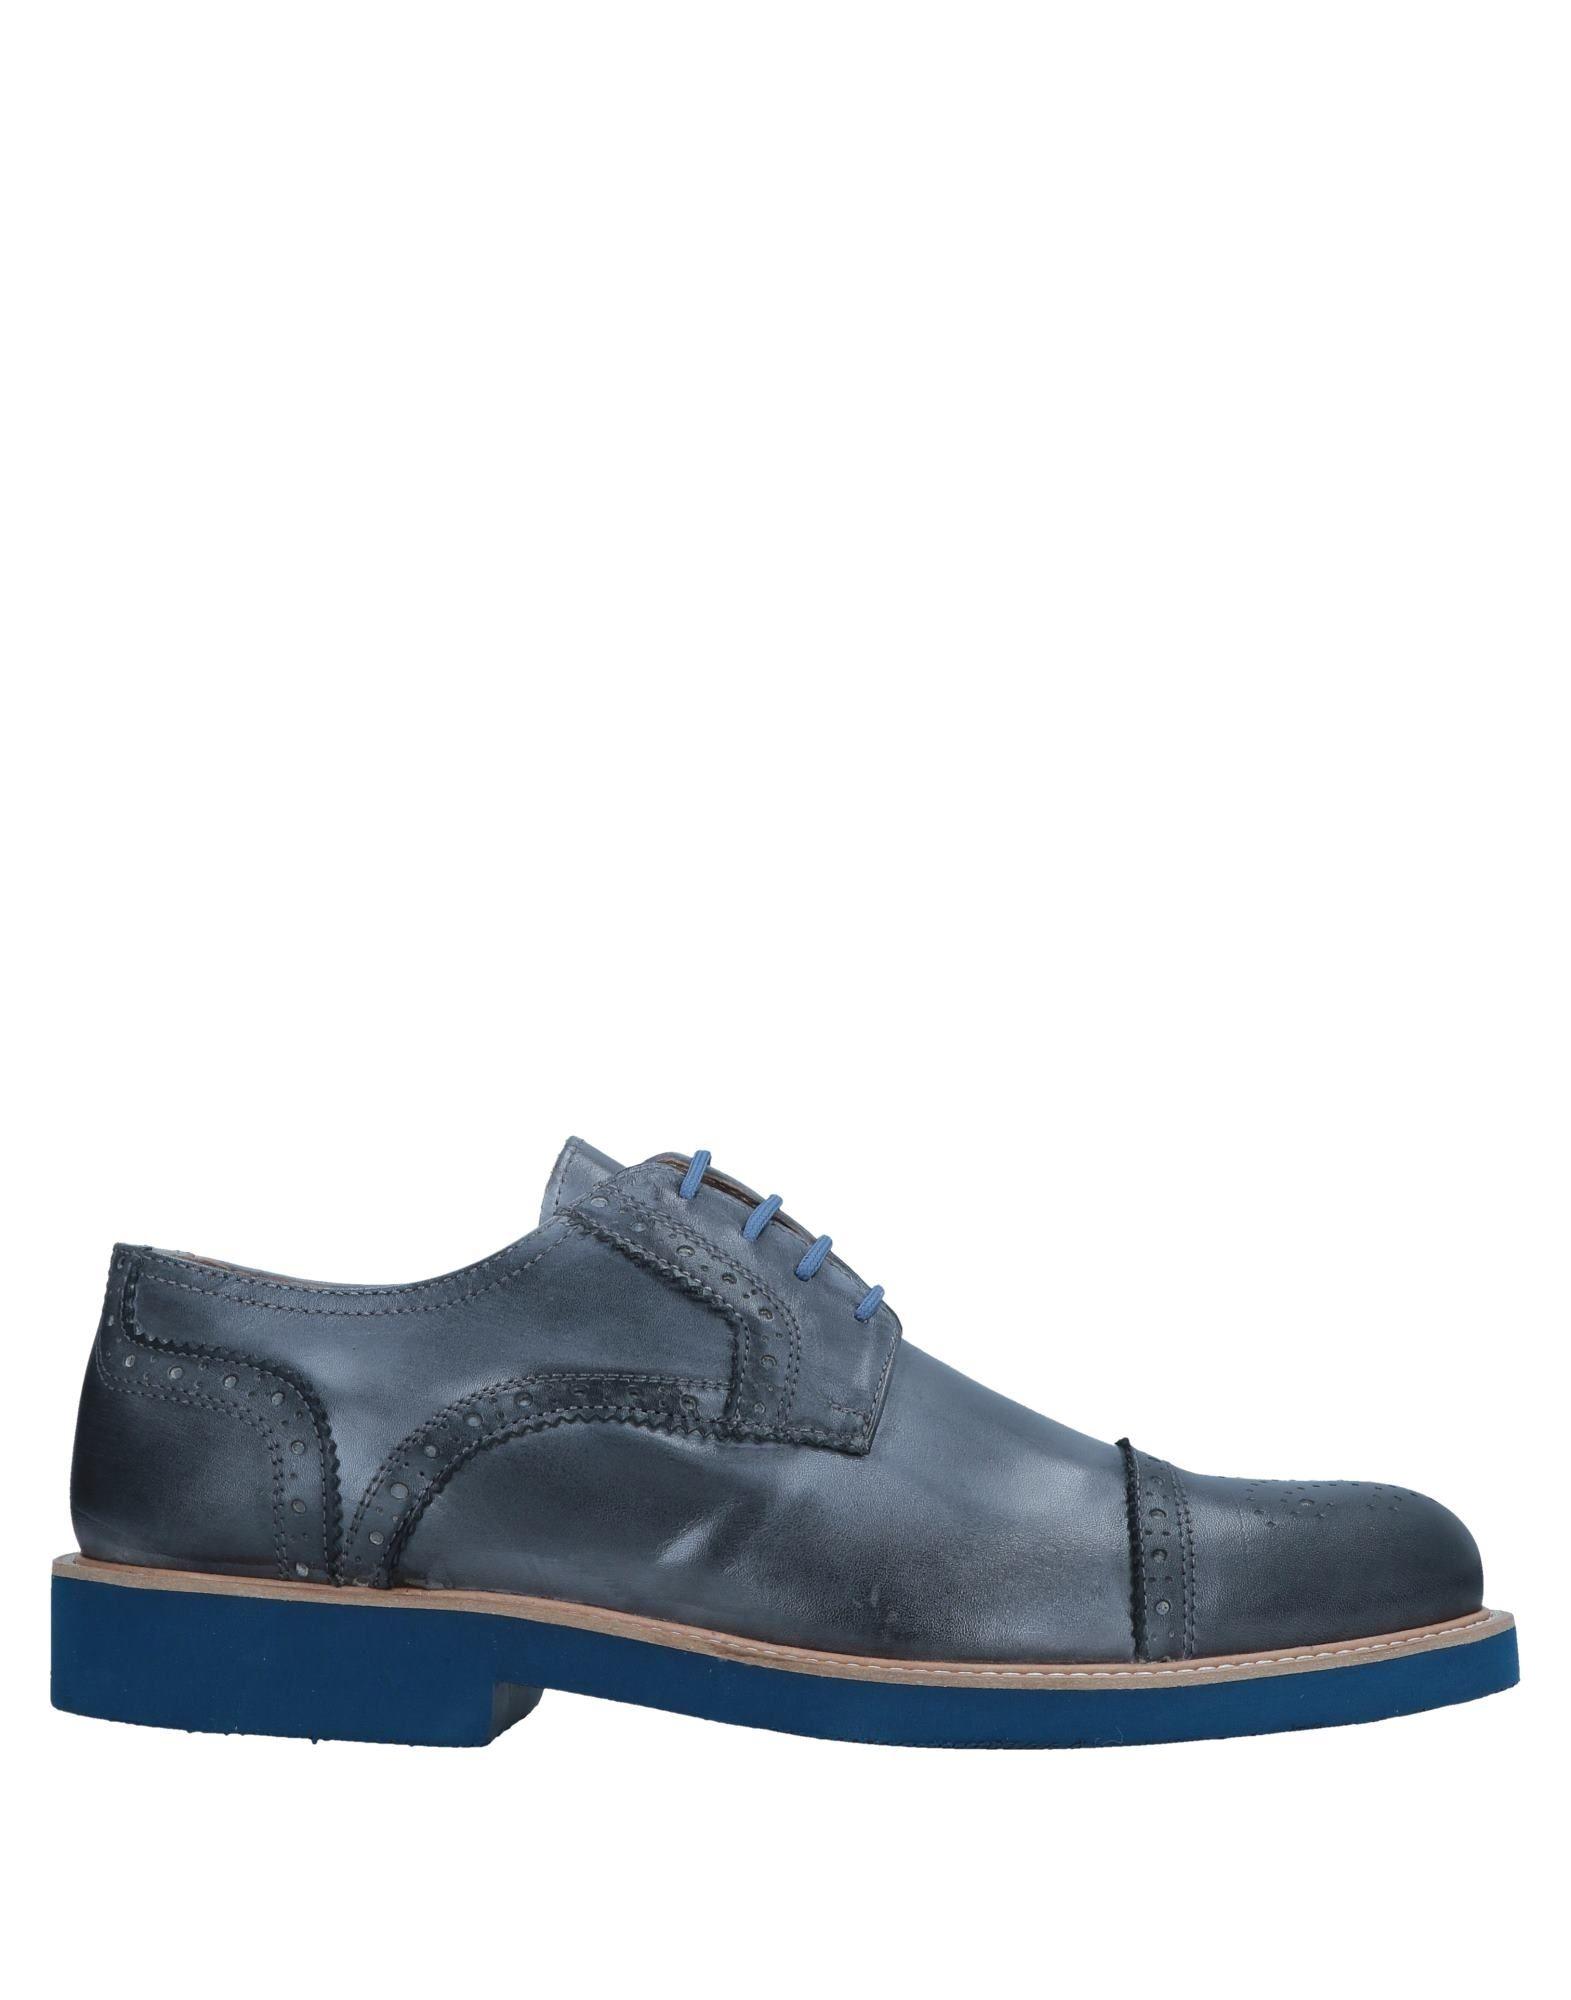 Фото - EXTON Обувь на шнурках обувь на высокой платформе dkny